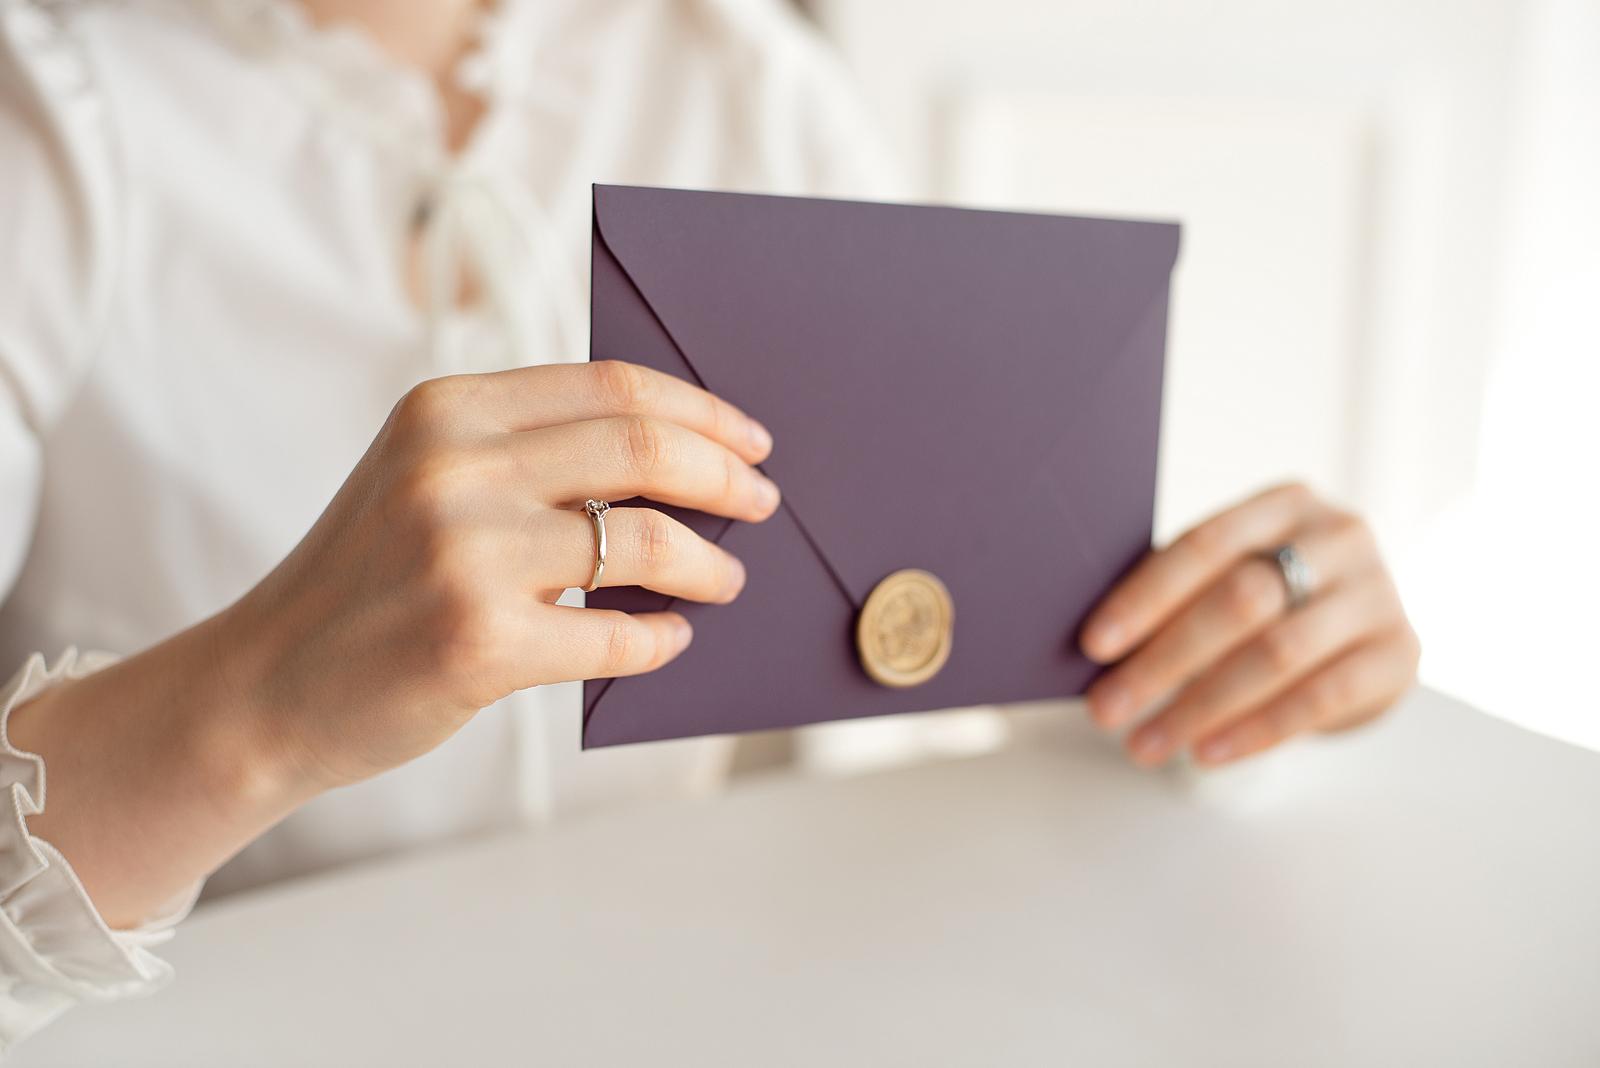 Premises Liability: The Role of Invitees